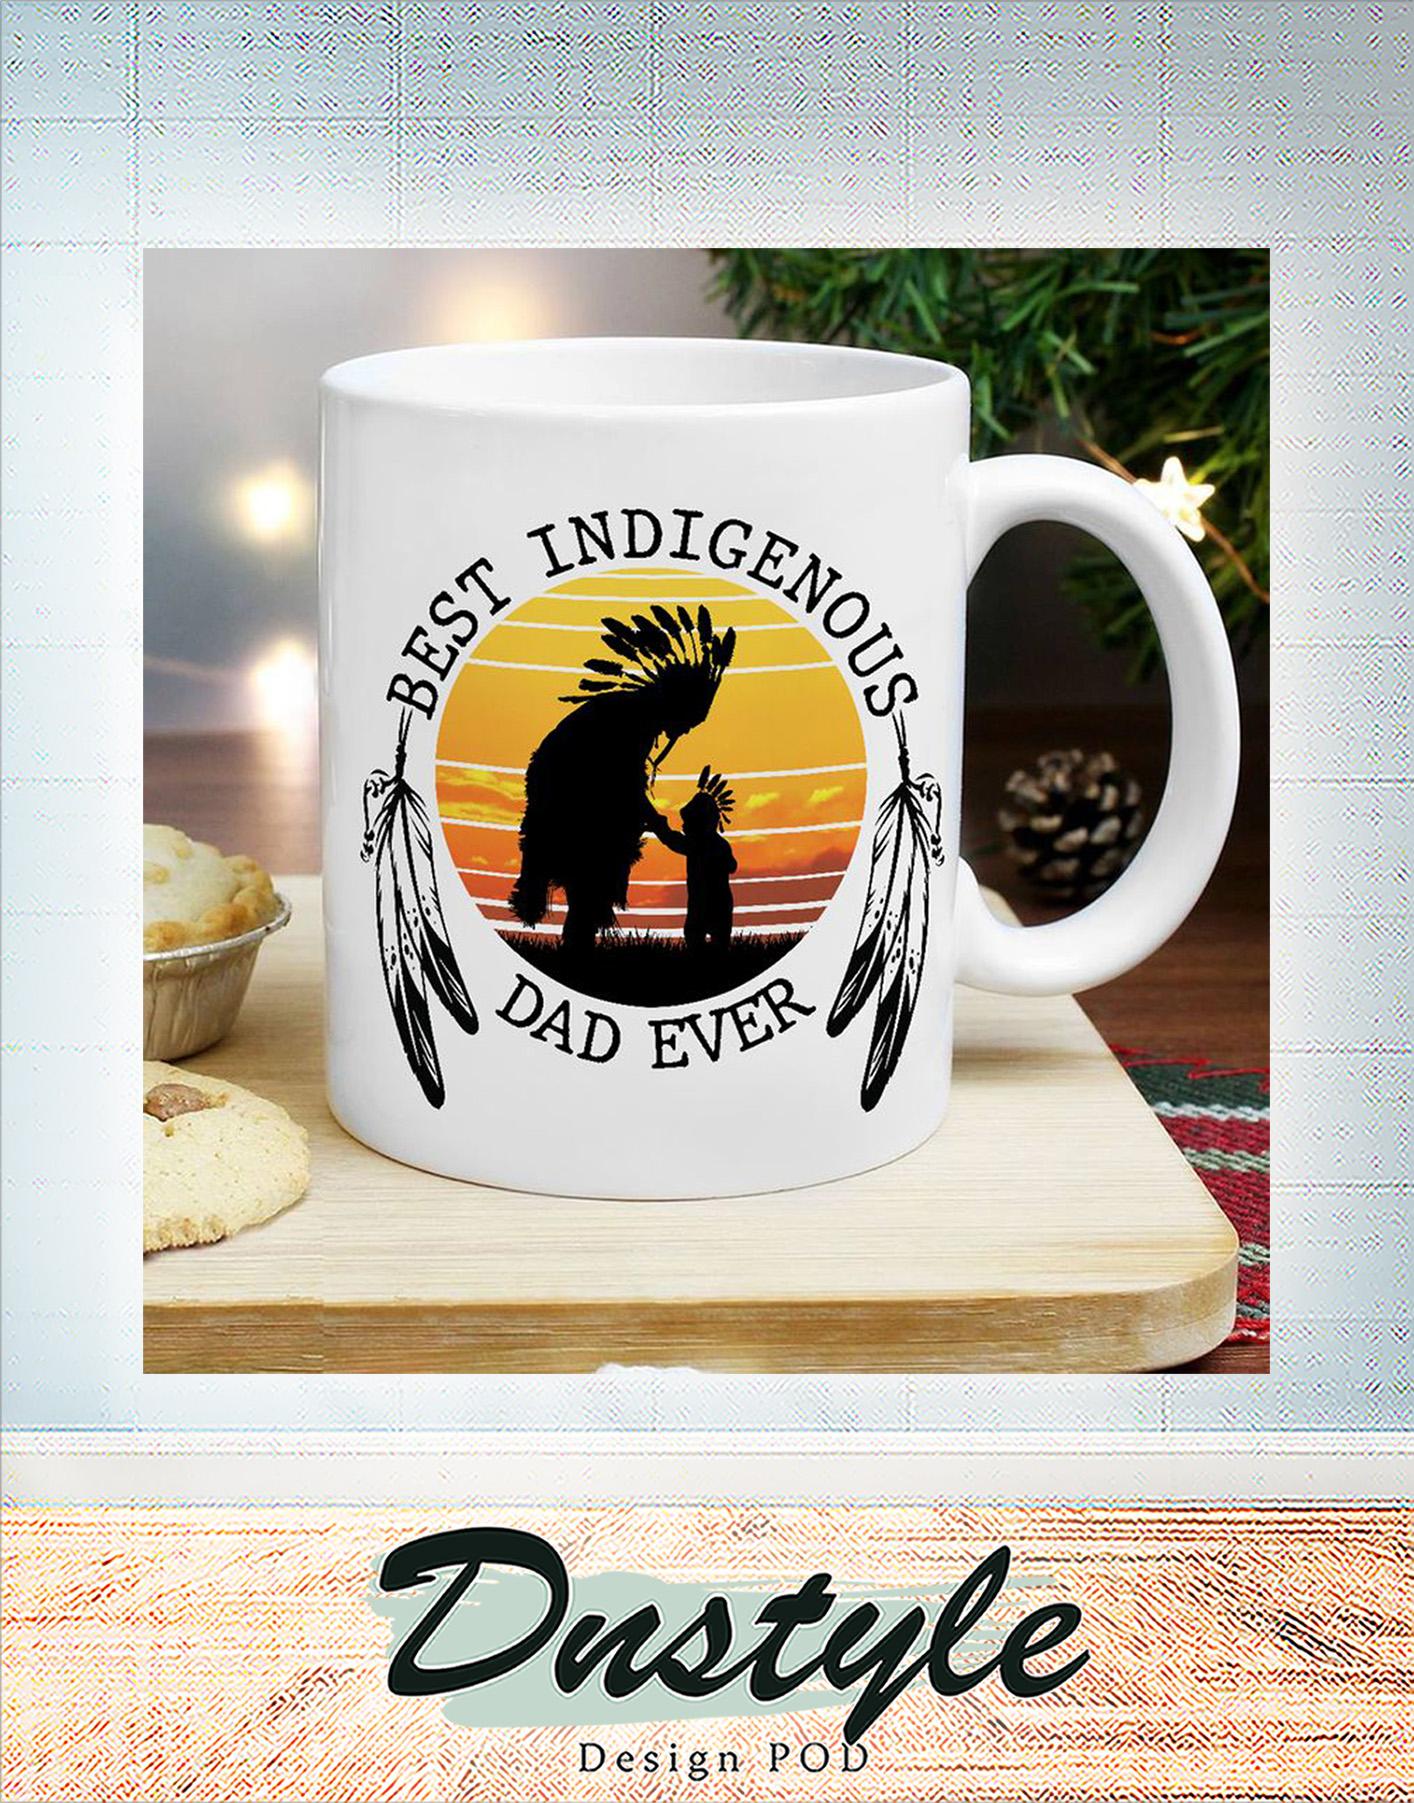 Native American Best indigenous dad ever mug 1